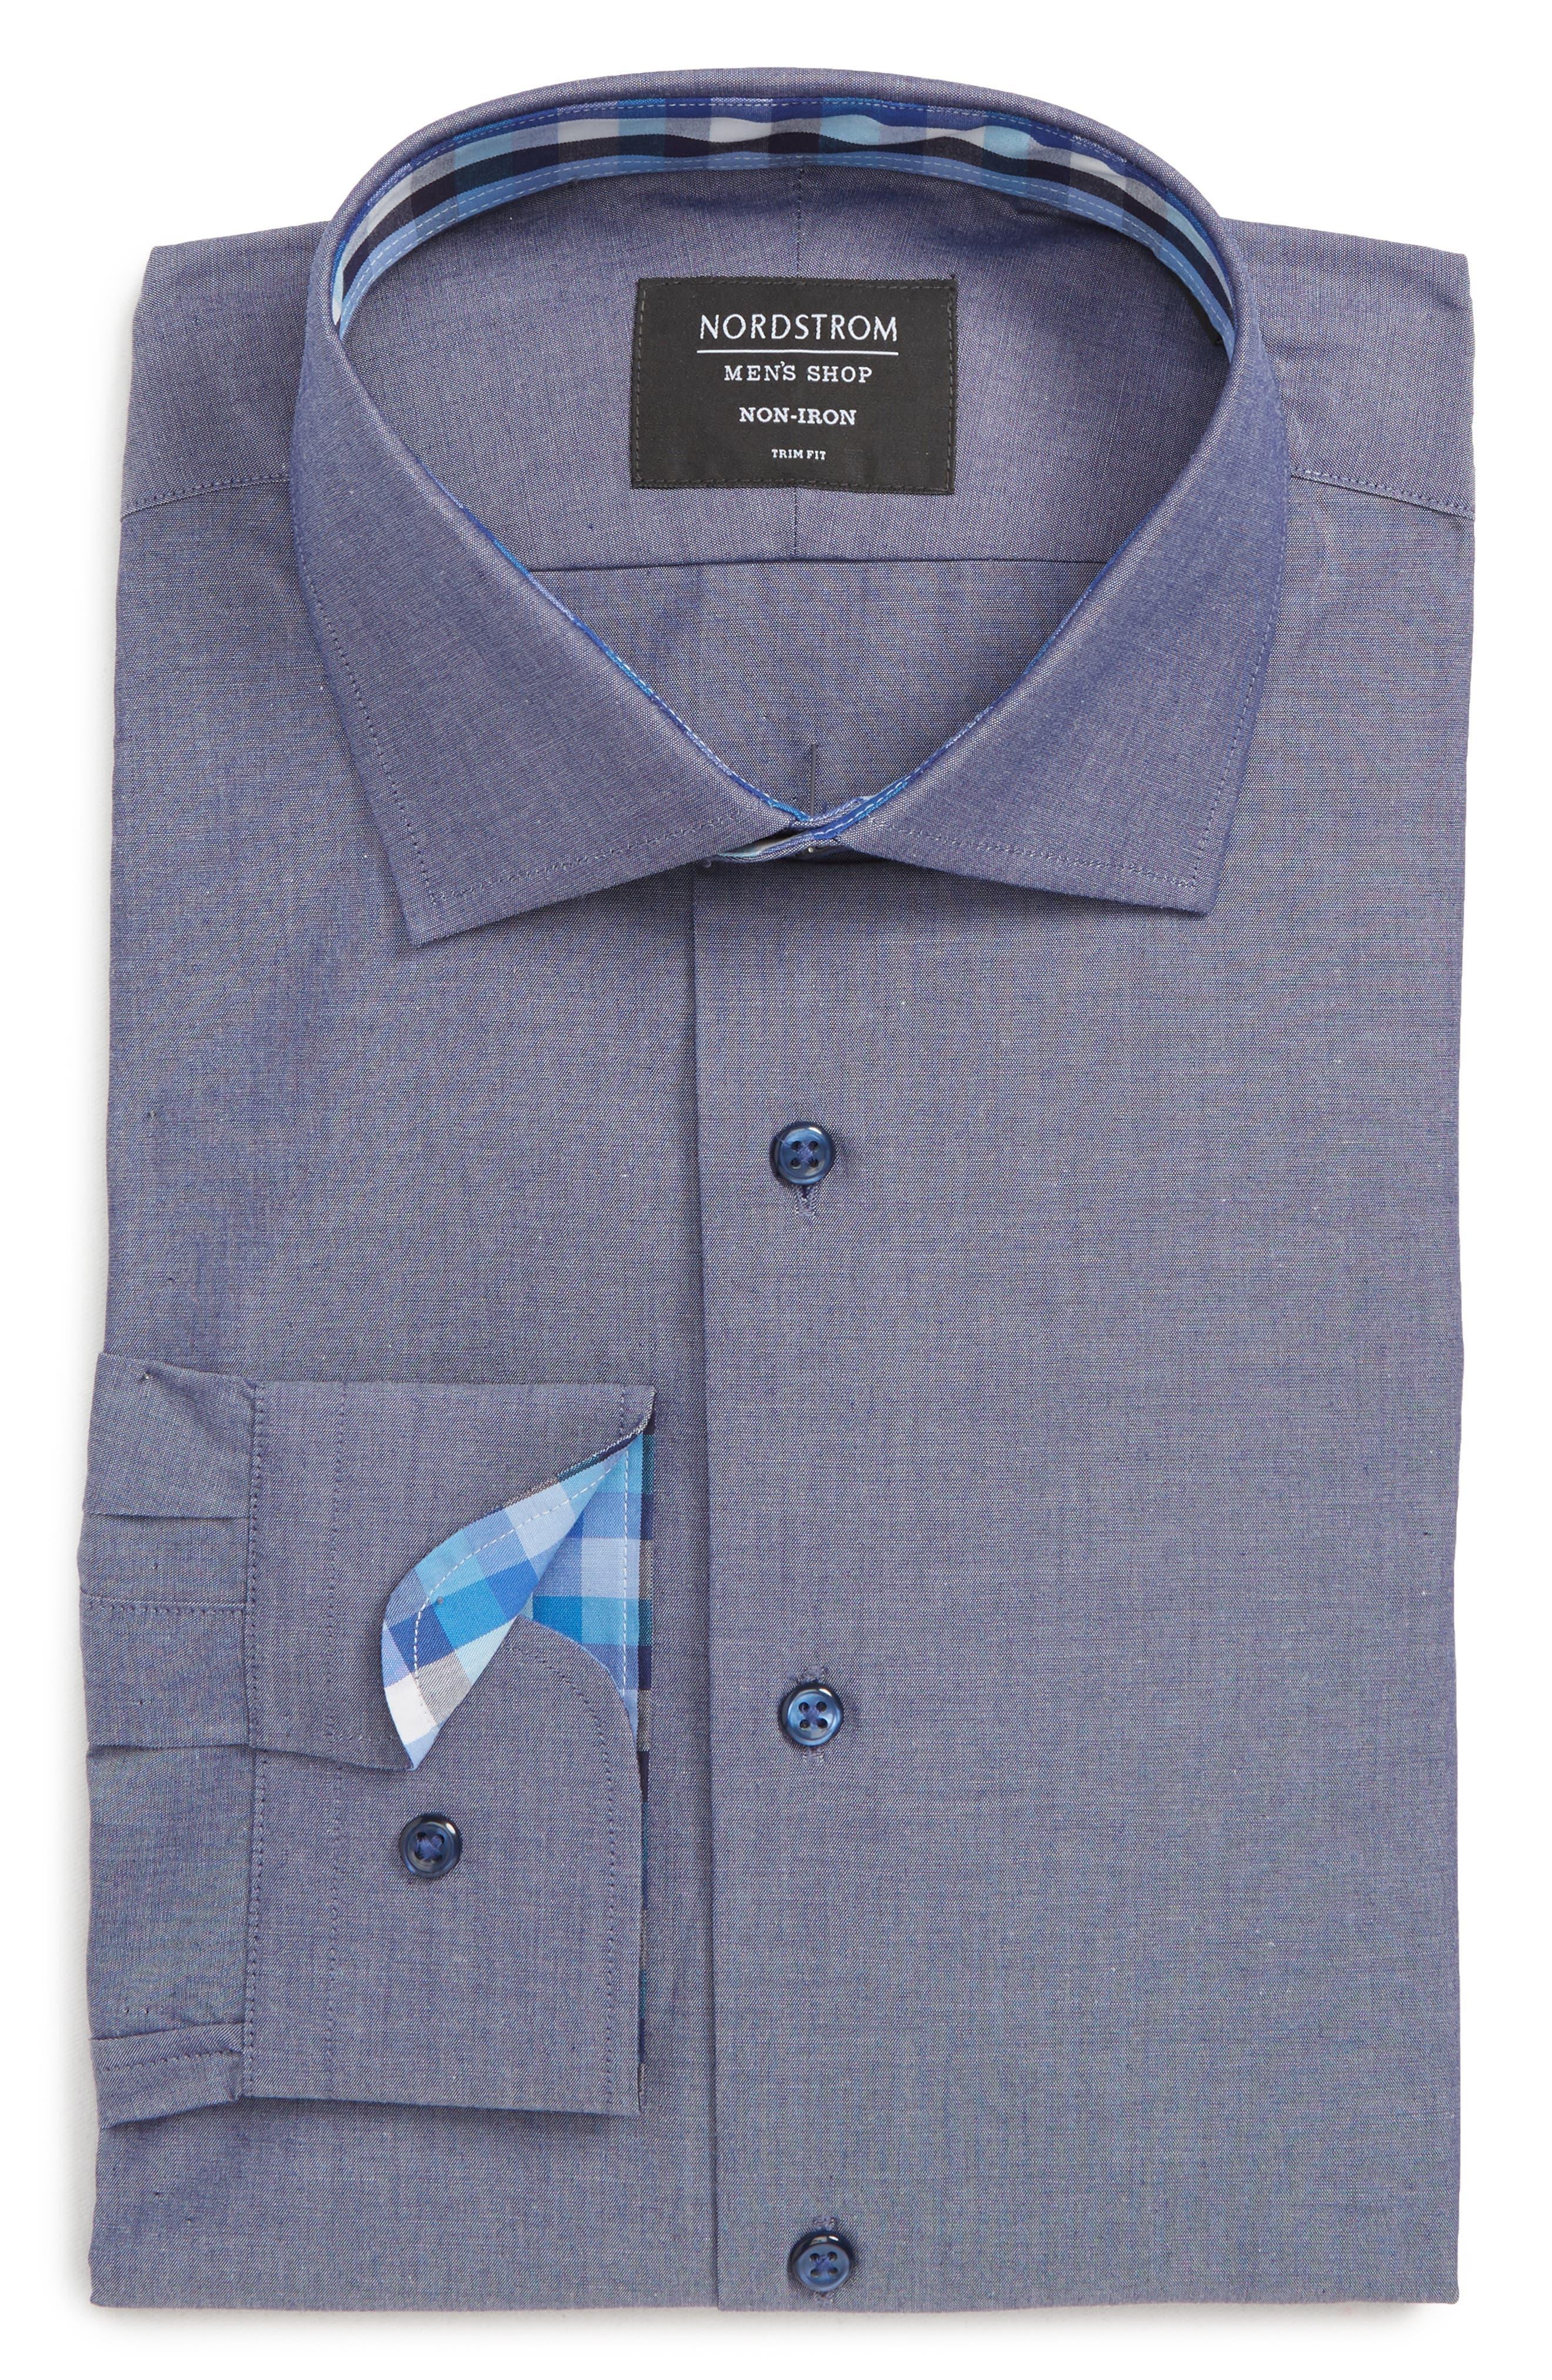 Trim Fit Non-Iron Solid Dress Shirt, Main, color, 420